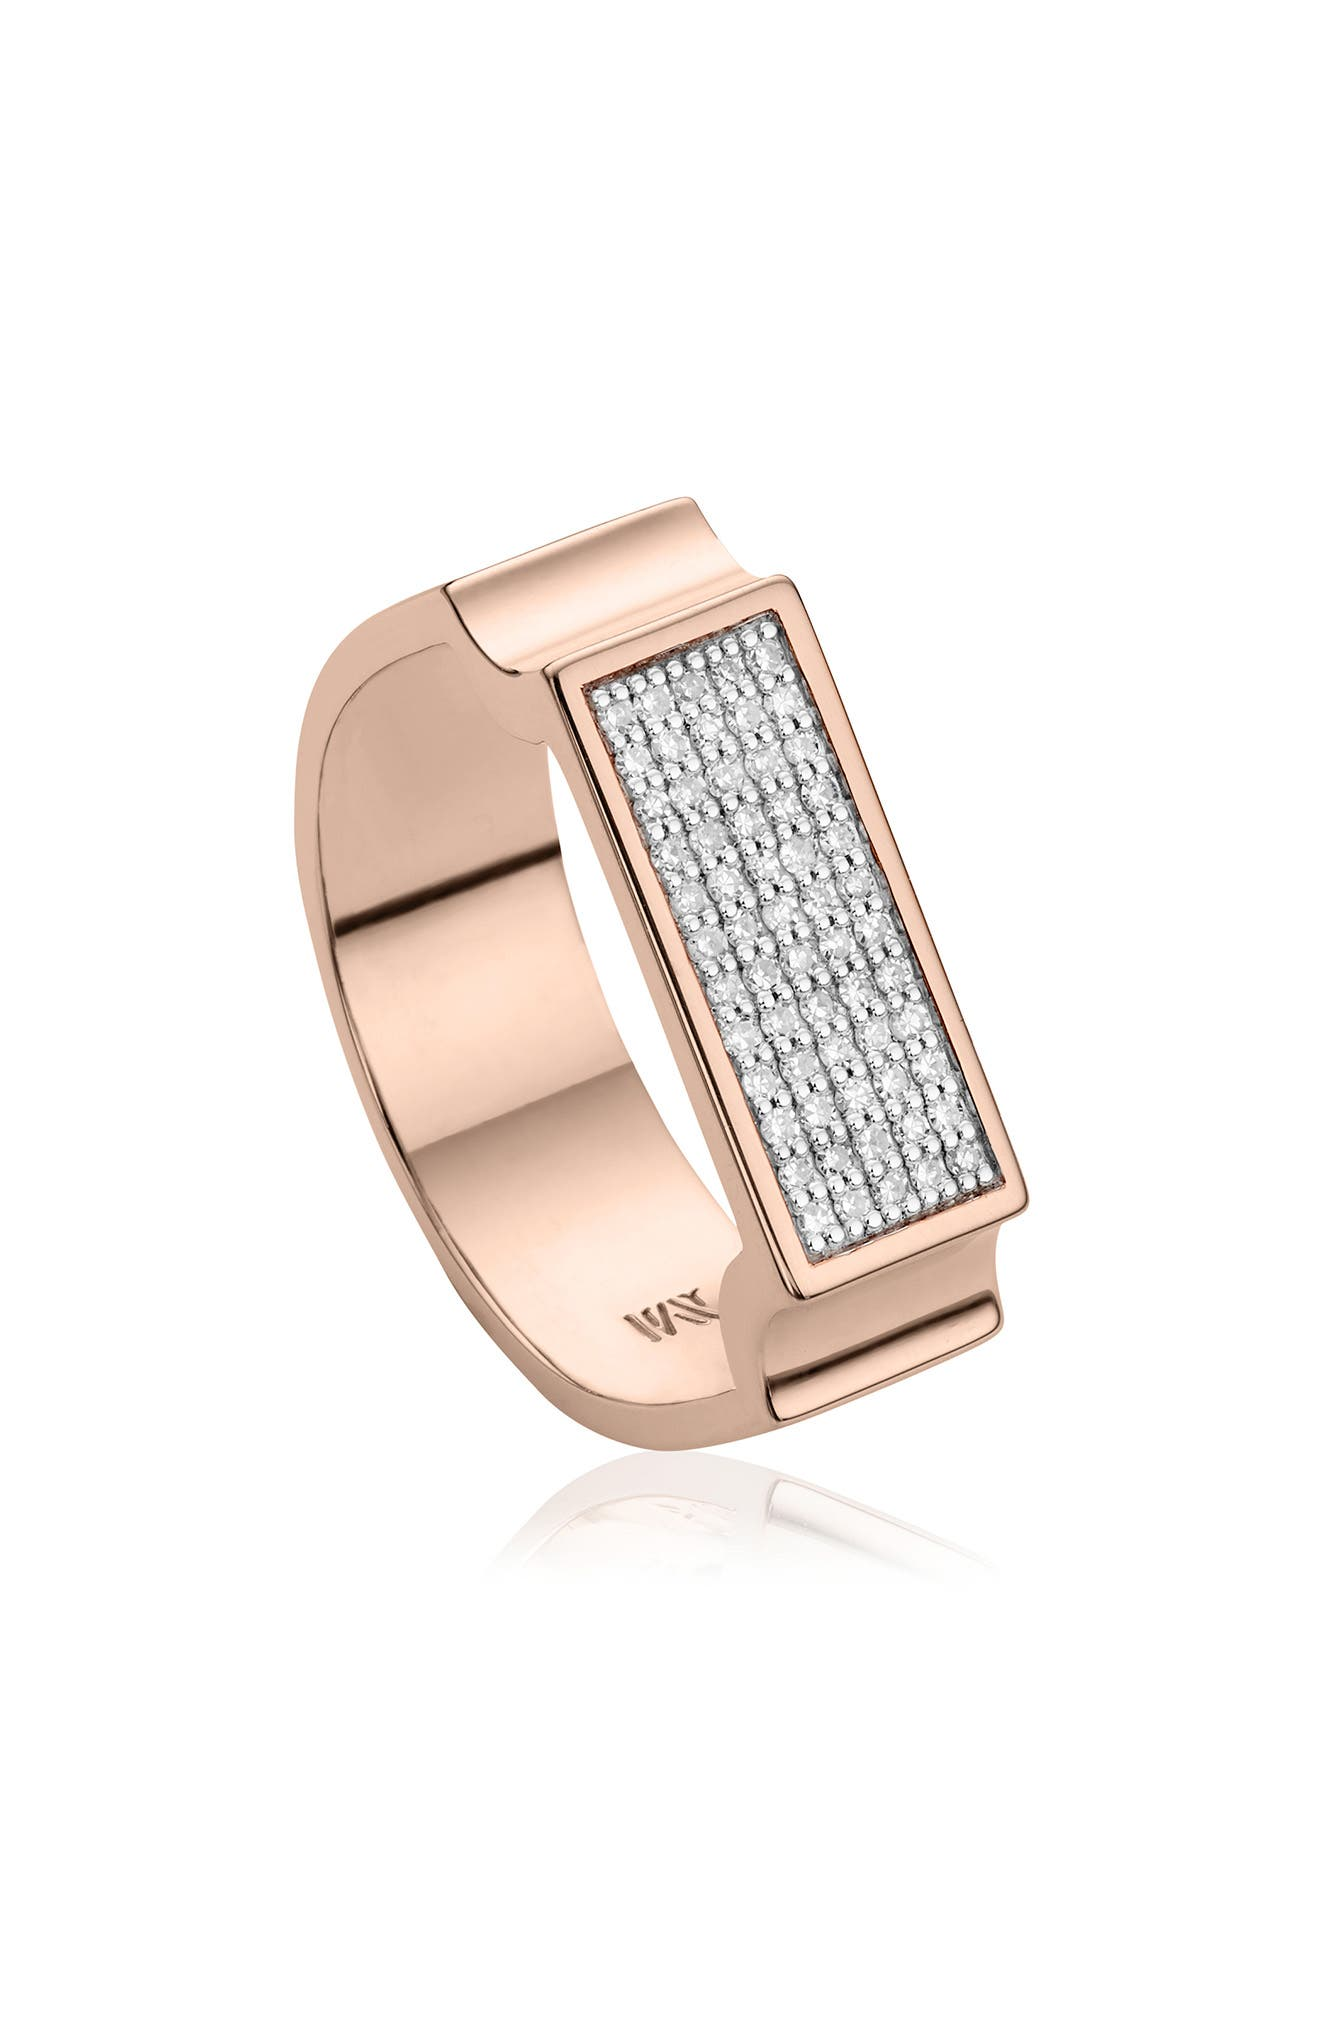 MONICA VINADER, Diamond Signature Wide Ring, Main thumbnail 1, color, ROSE GOLD/ DIAMOND